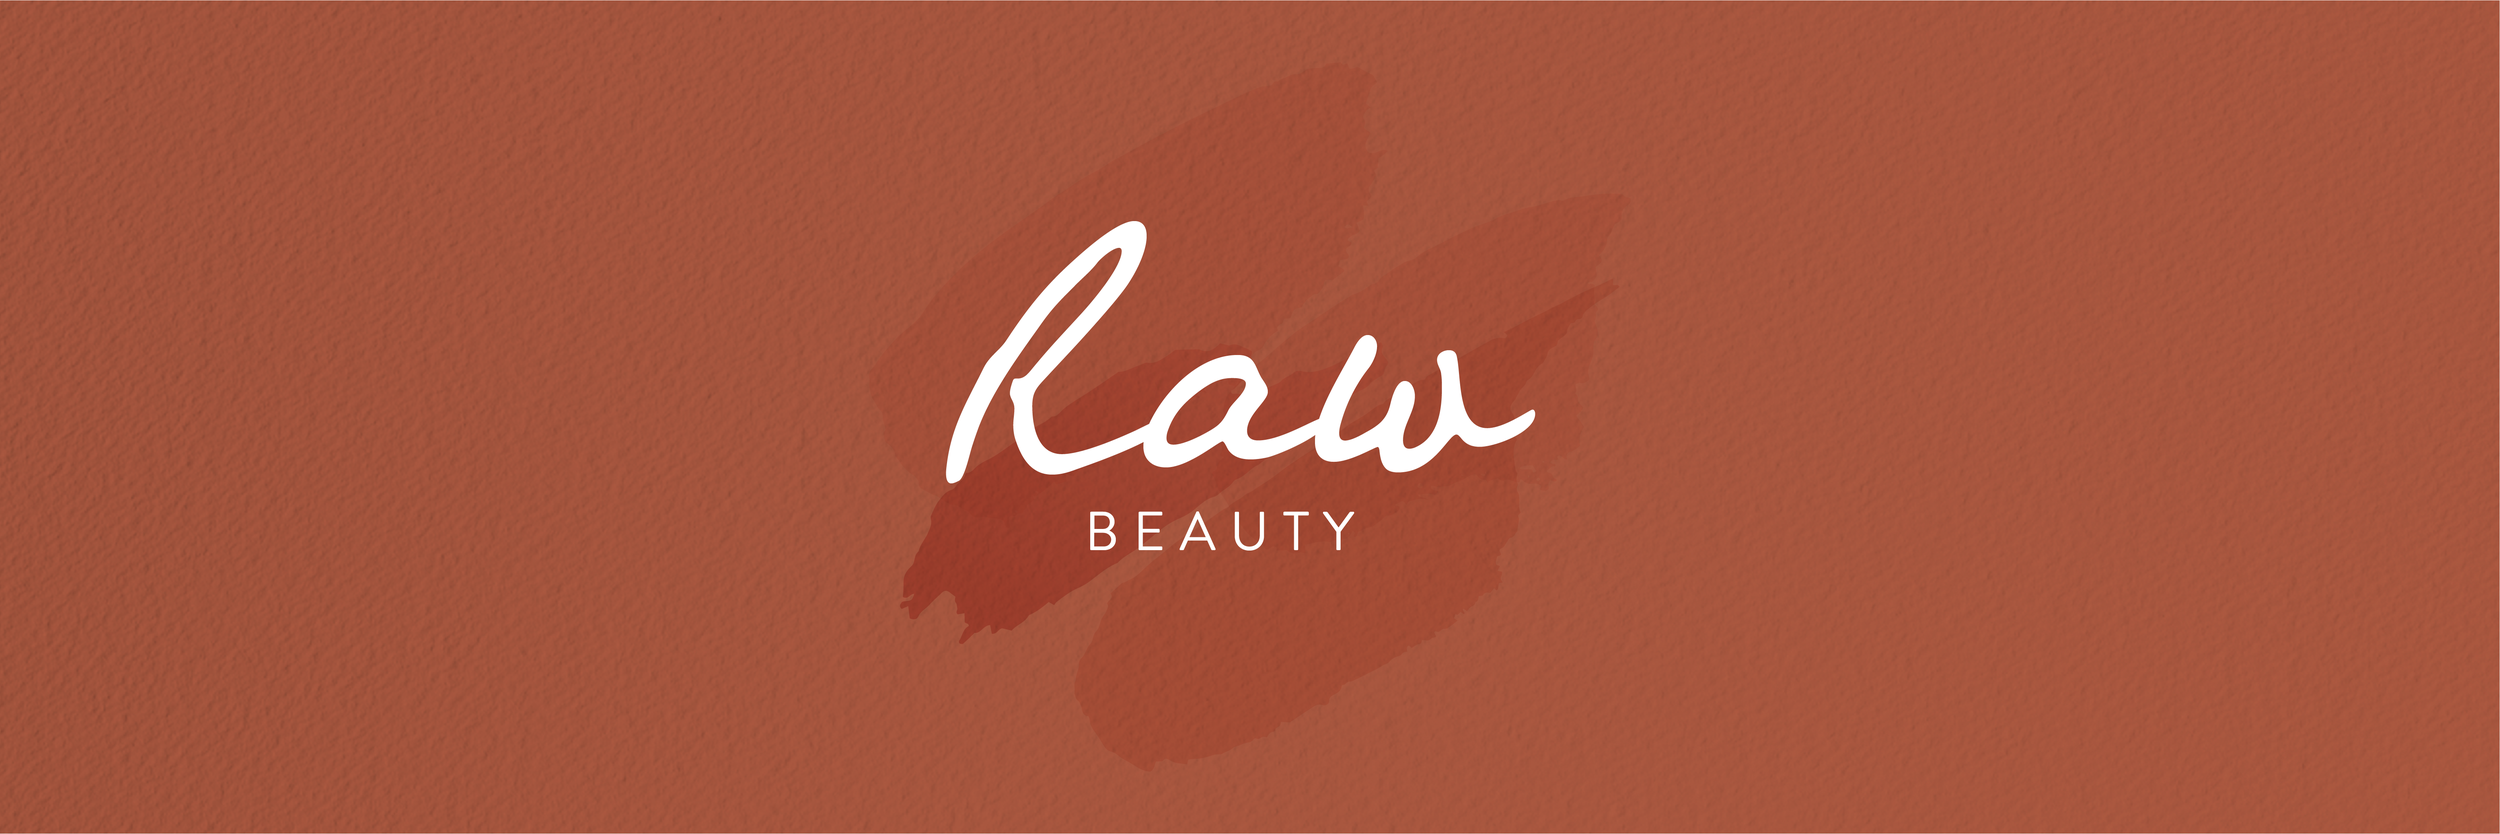 rawbeauty_portfolio-01.png